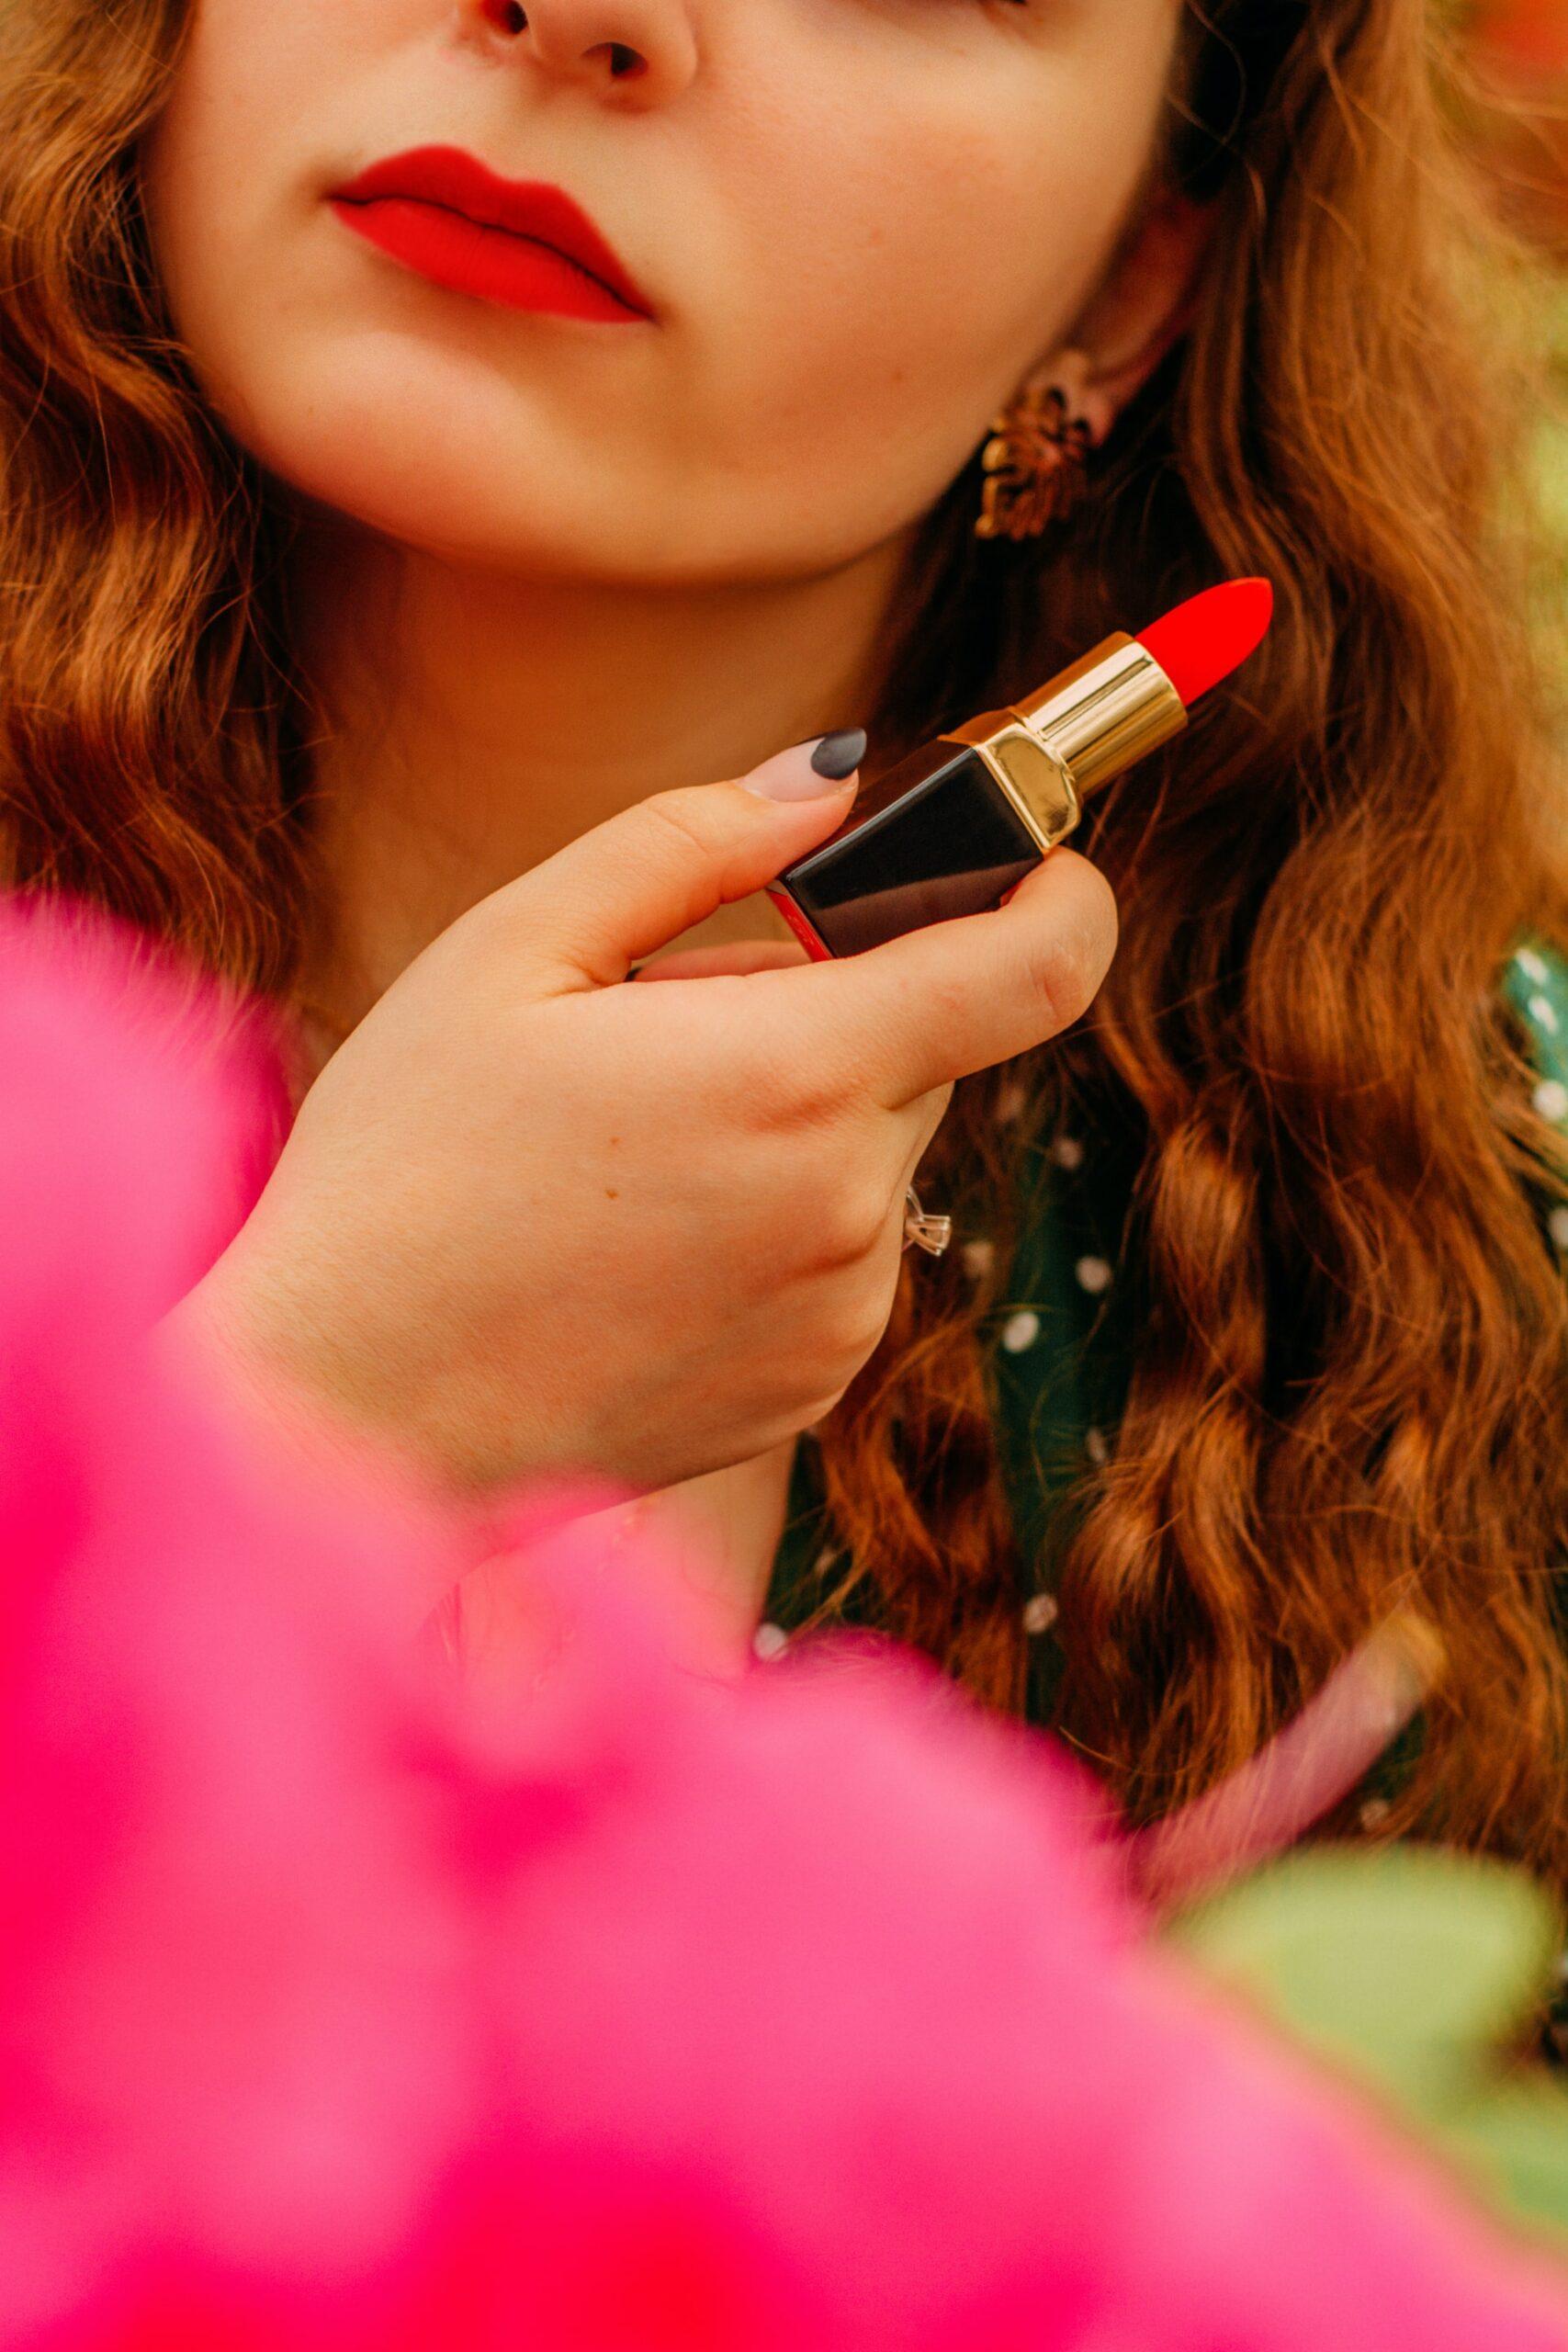 Nyx Lipstick Swatches, Nyx Lipstick